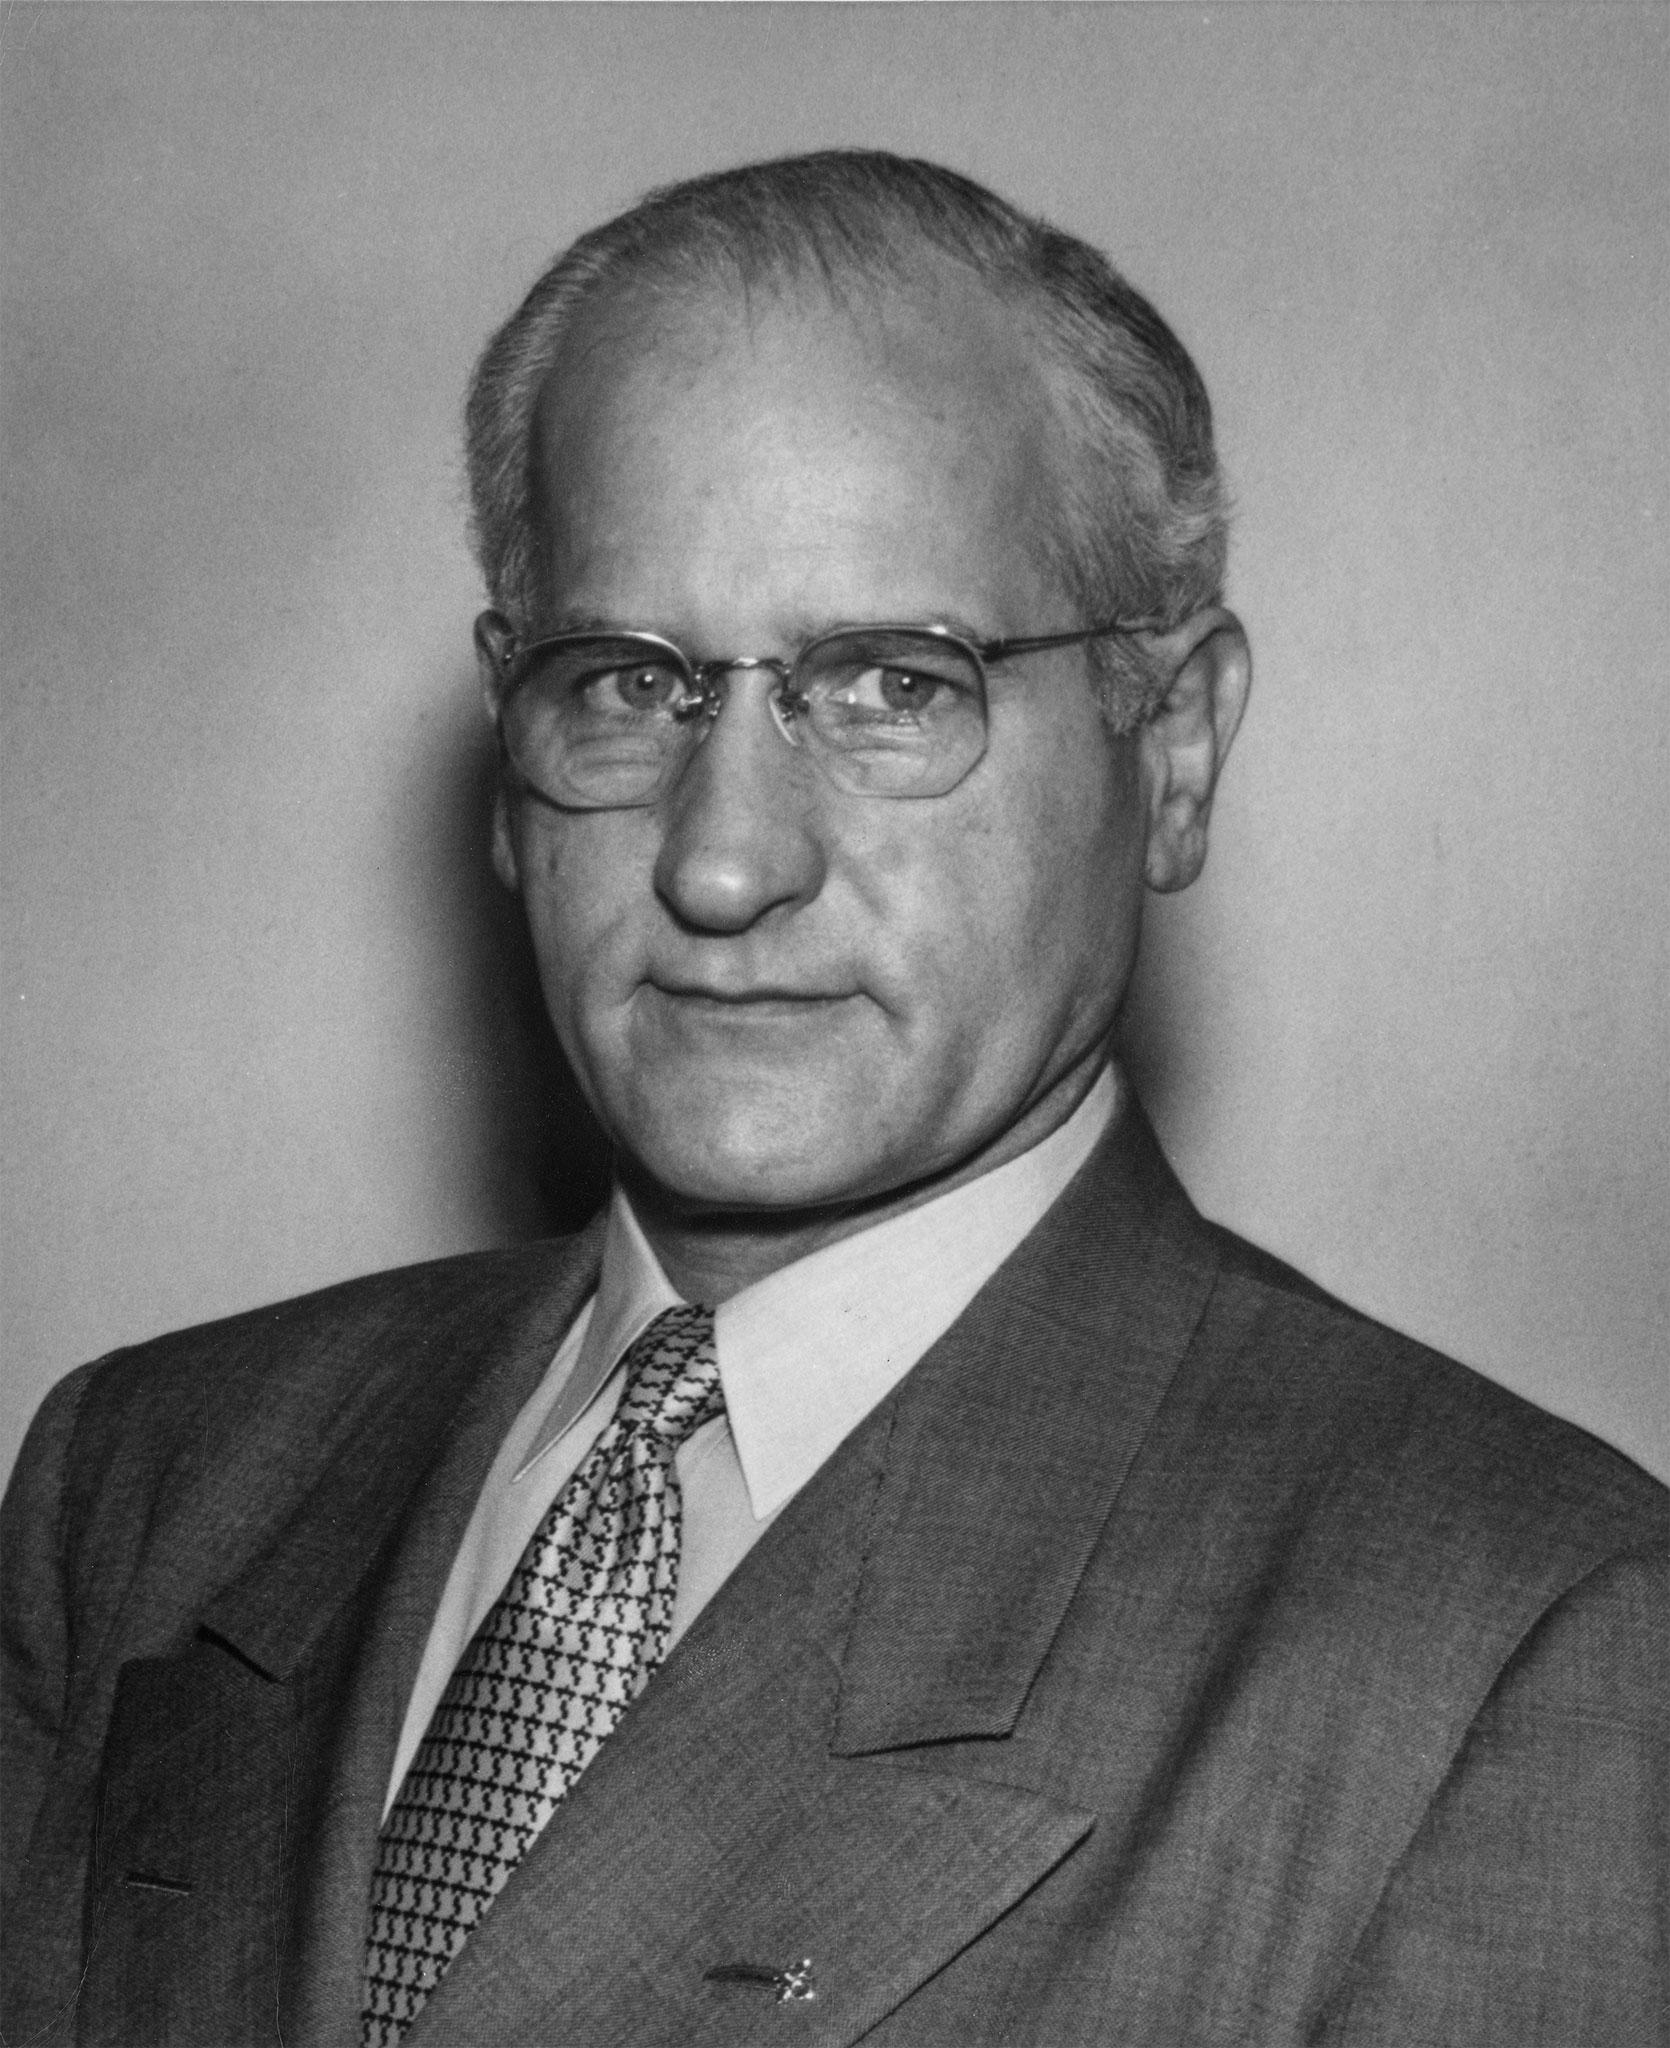 Oklahoma Farm Bureau president John I. Taylor